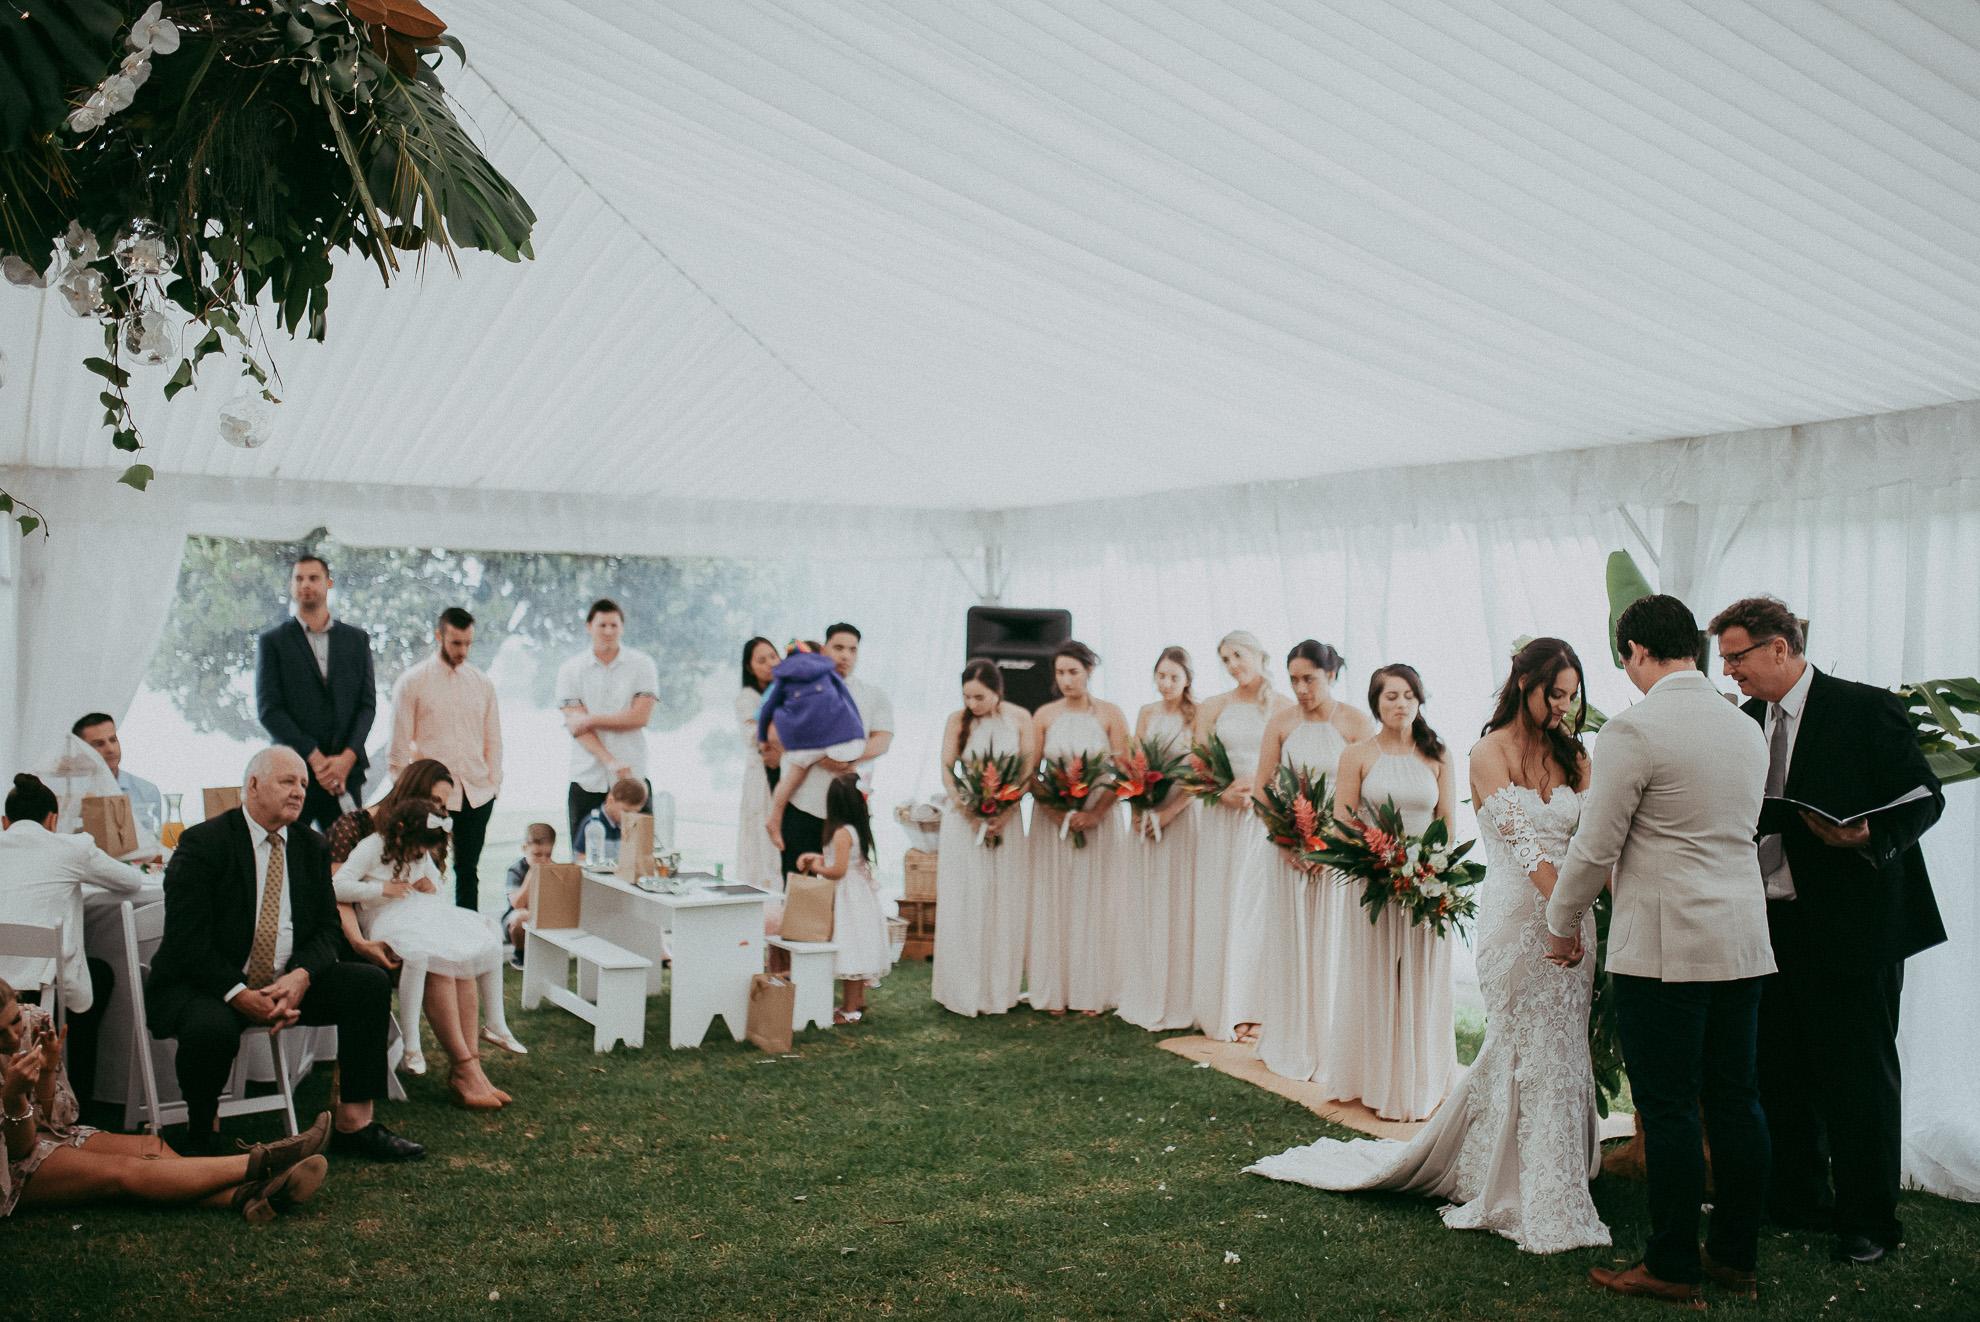 wedding-by-levien-468.JPG